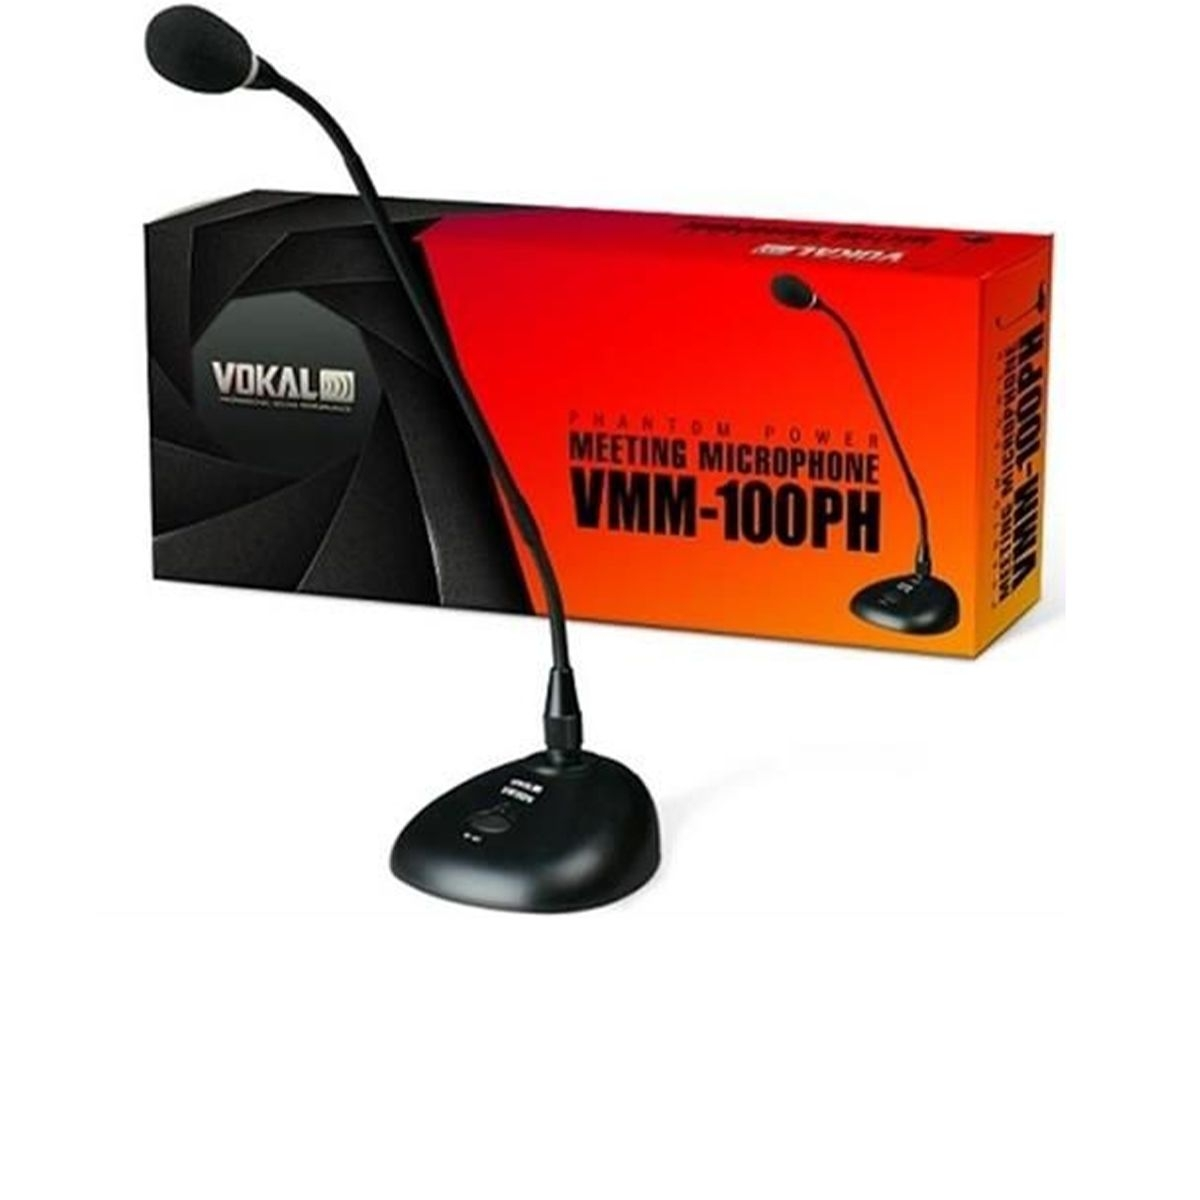 Microfone de Mesa Profissional Vokal VMM-100 PH